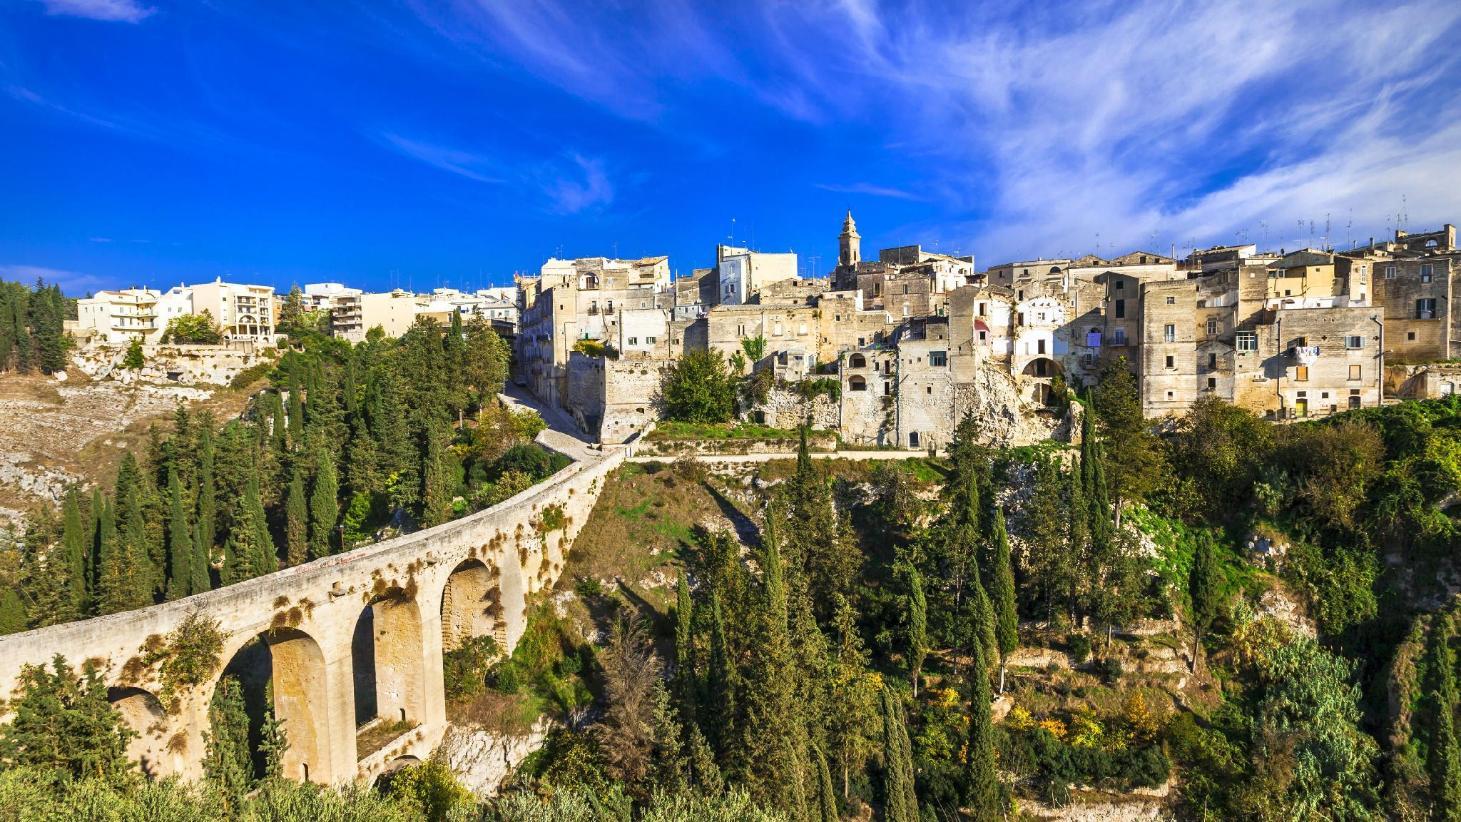 30 Best Gravina In Puglia Hotels In 2020 Great Savings Reviews Of Hotels In Gravina In Puglia Italy